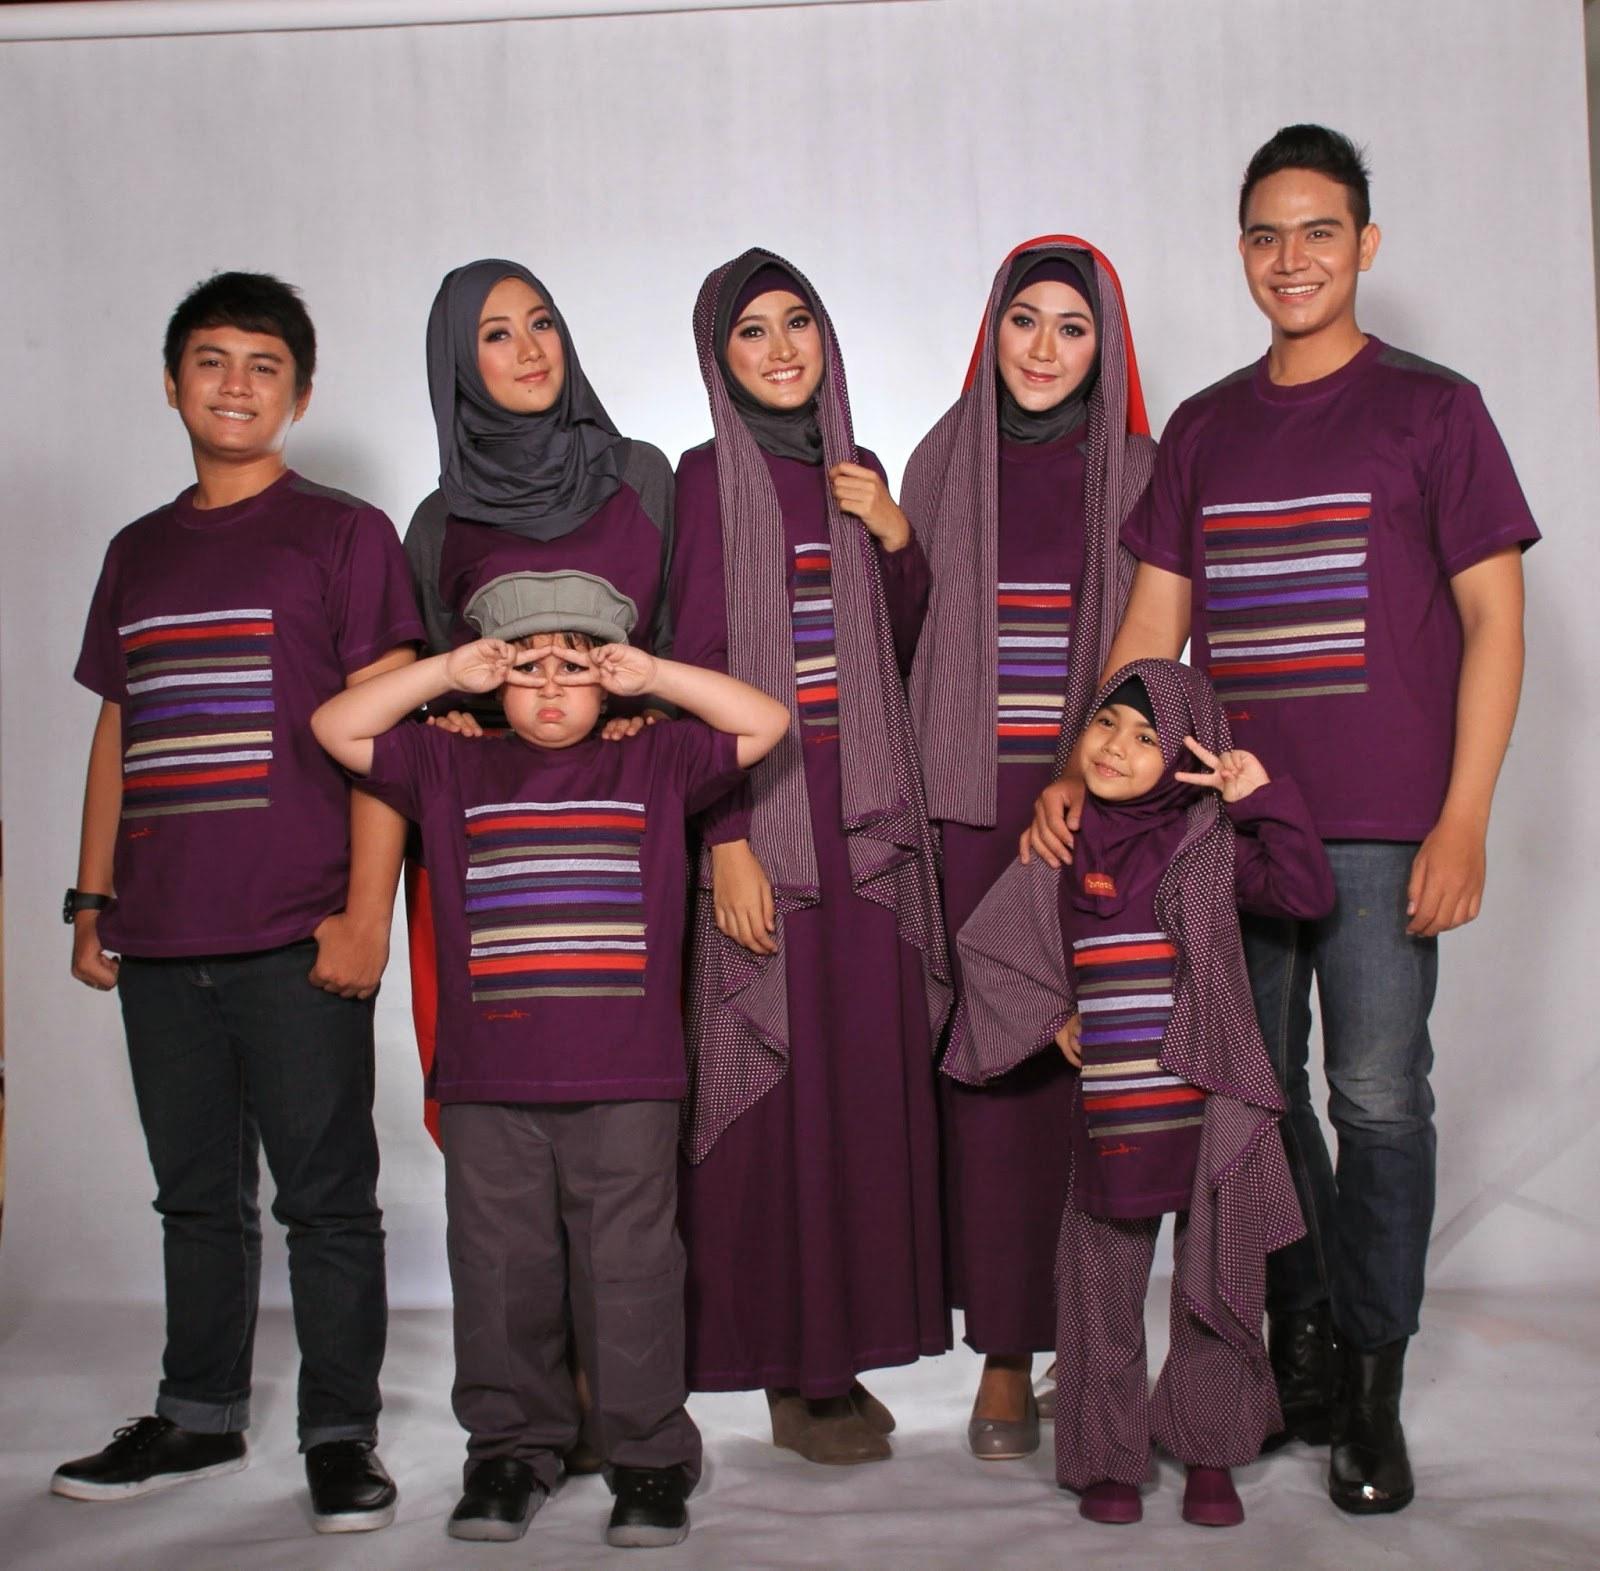 Model Baju Lebaran Seragam Keluarga Jxdu 25 Model Baju Lebaran Keluarga 2018 Kompak & Modis